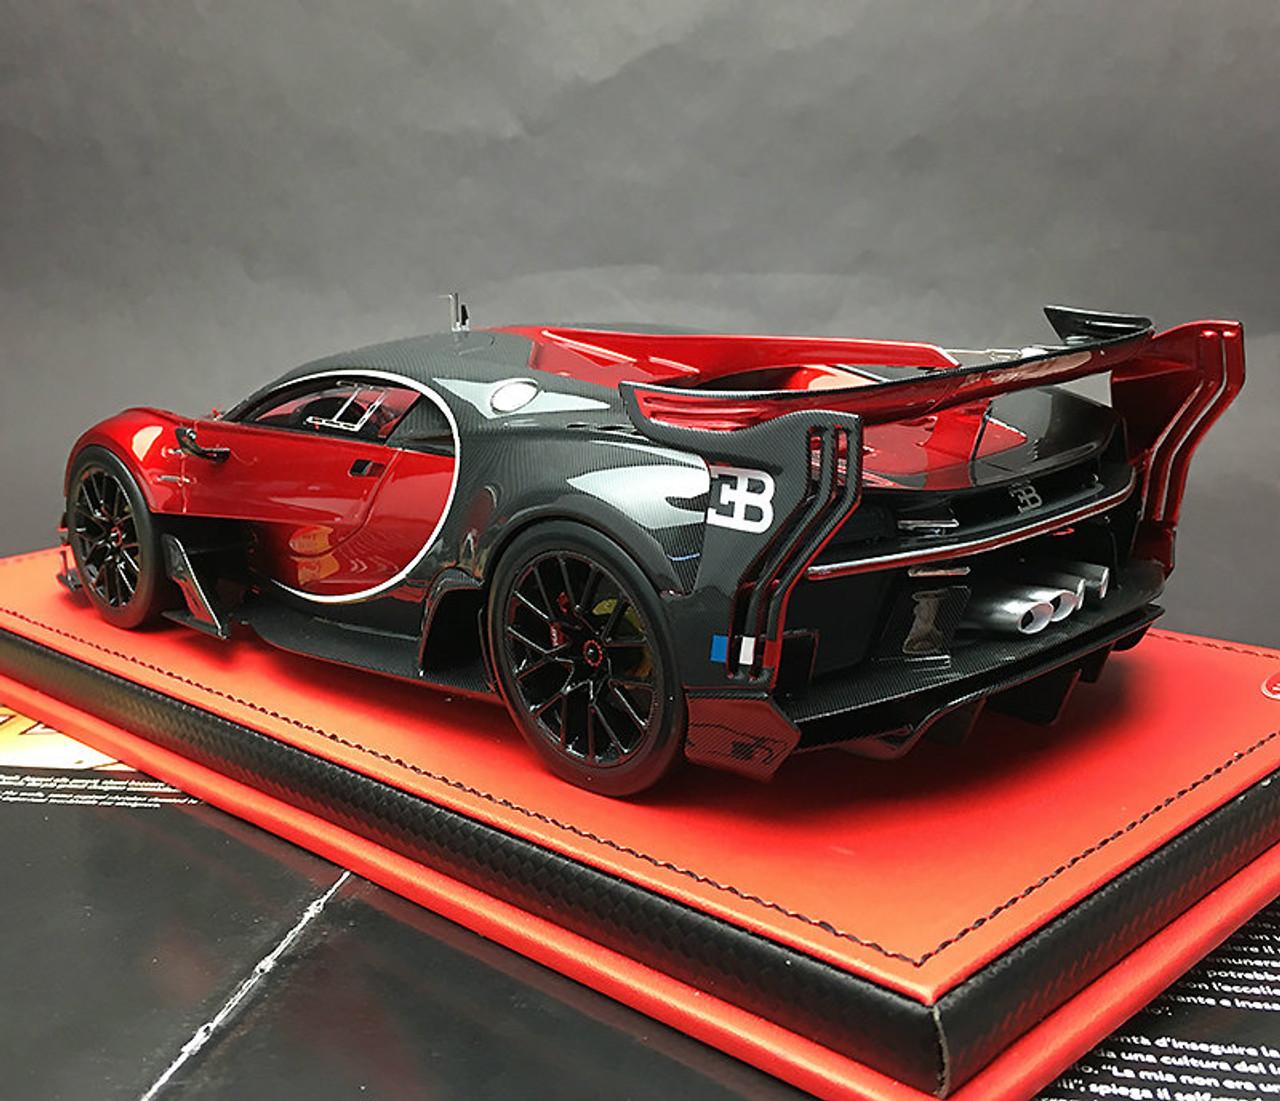 Bugatti Veyron Gt: 1/18 MR Bugatti Chiron VGT Vision GT W/ Certificate